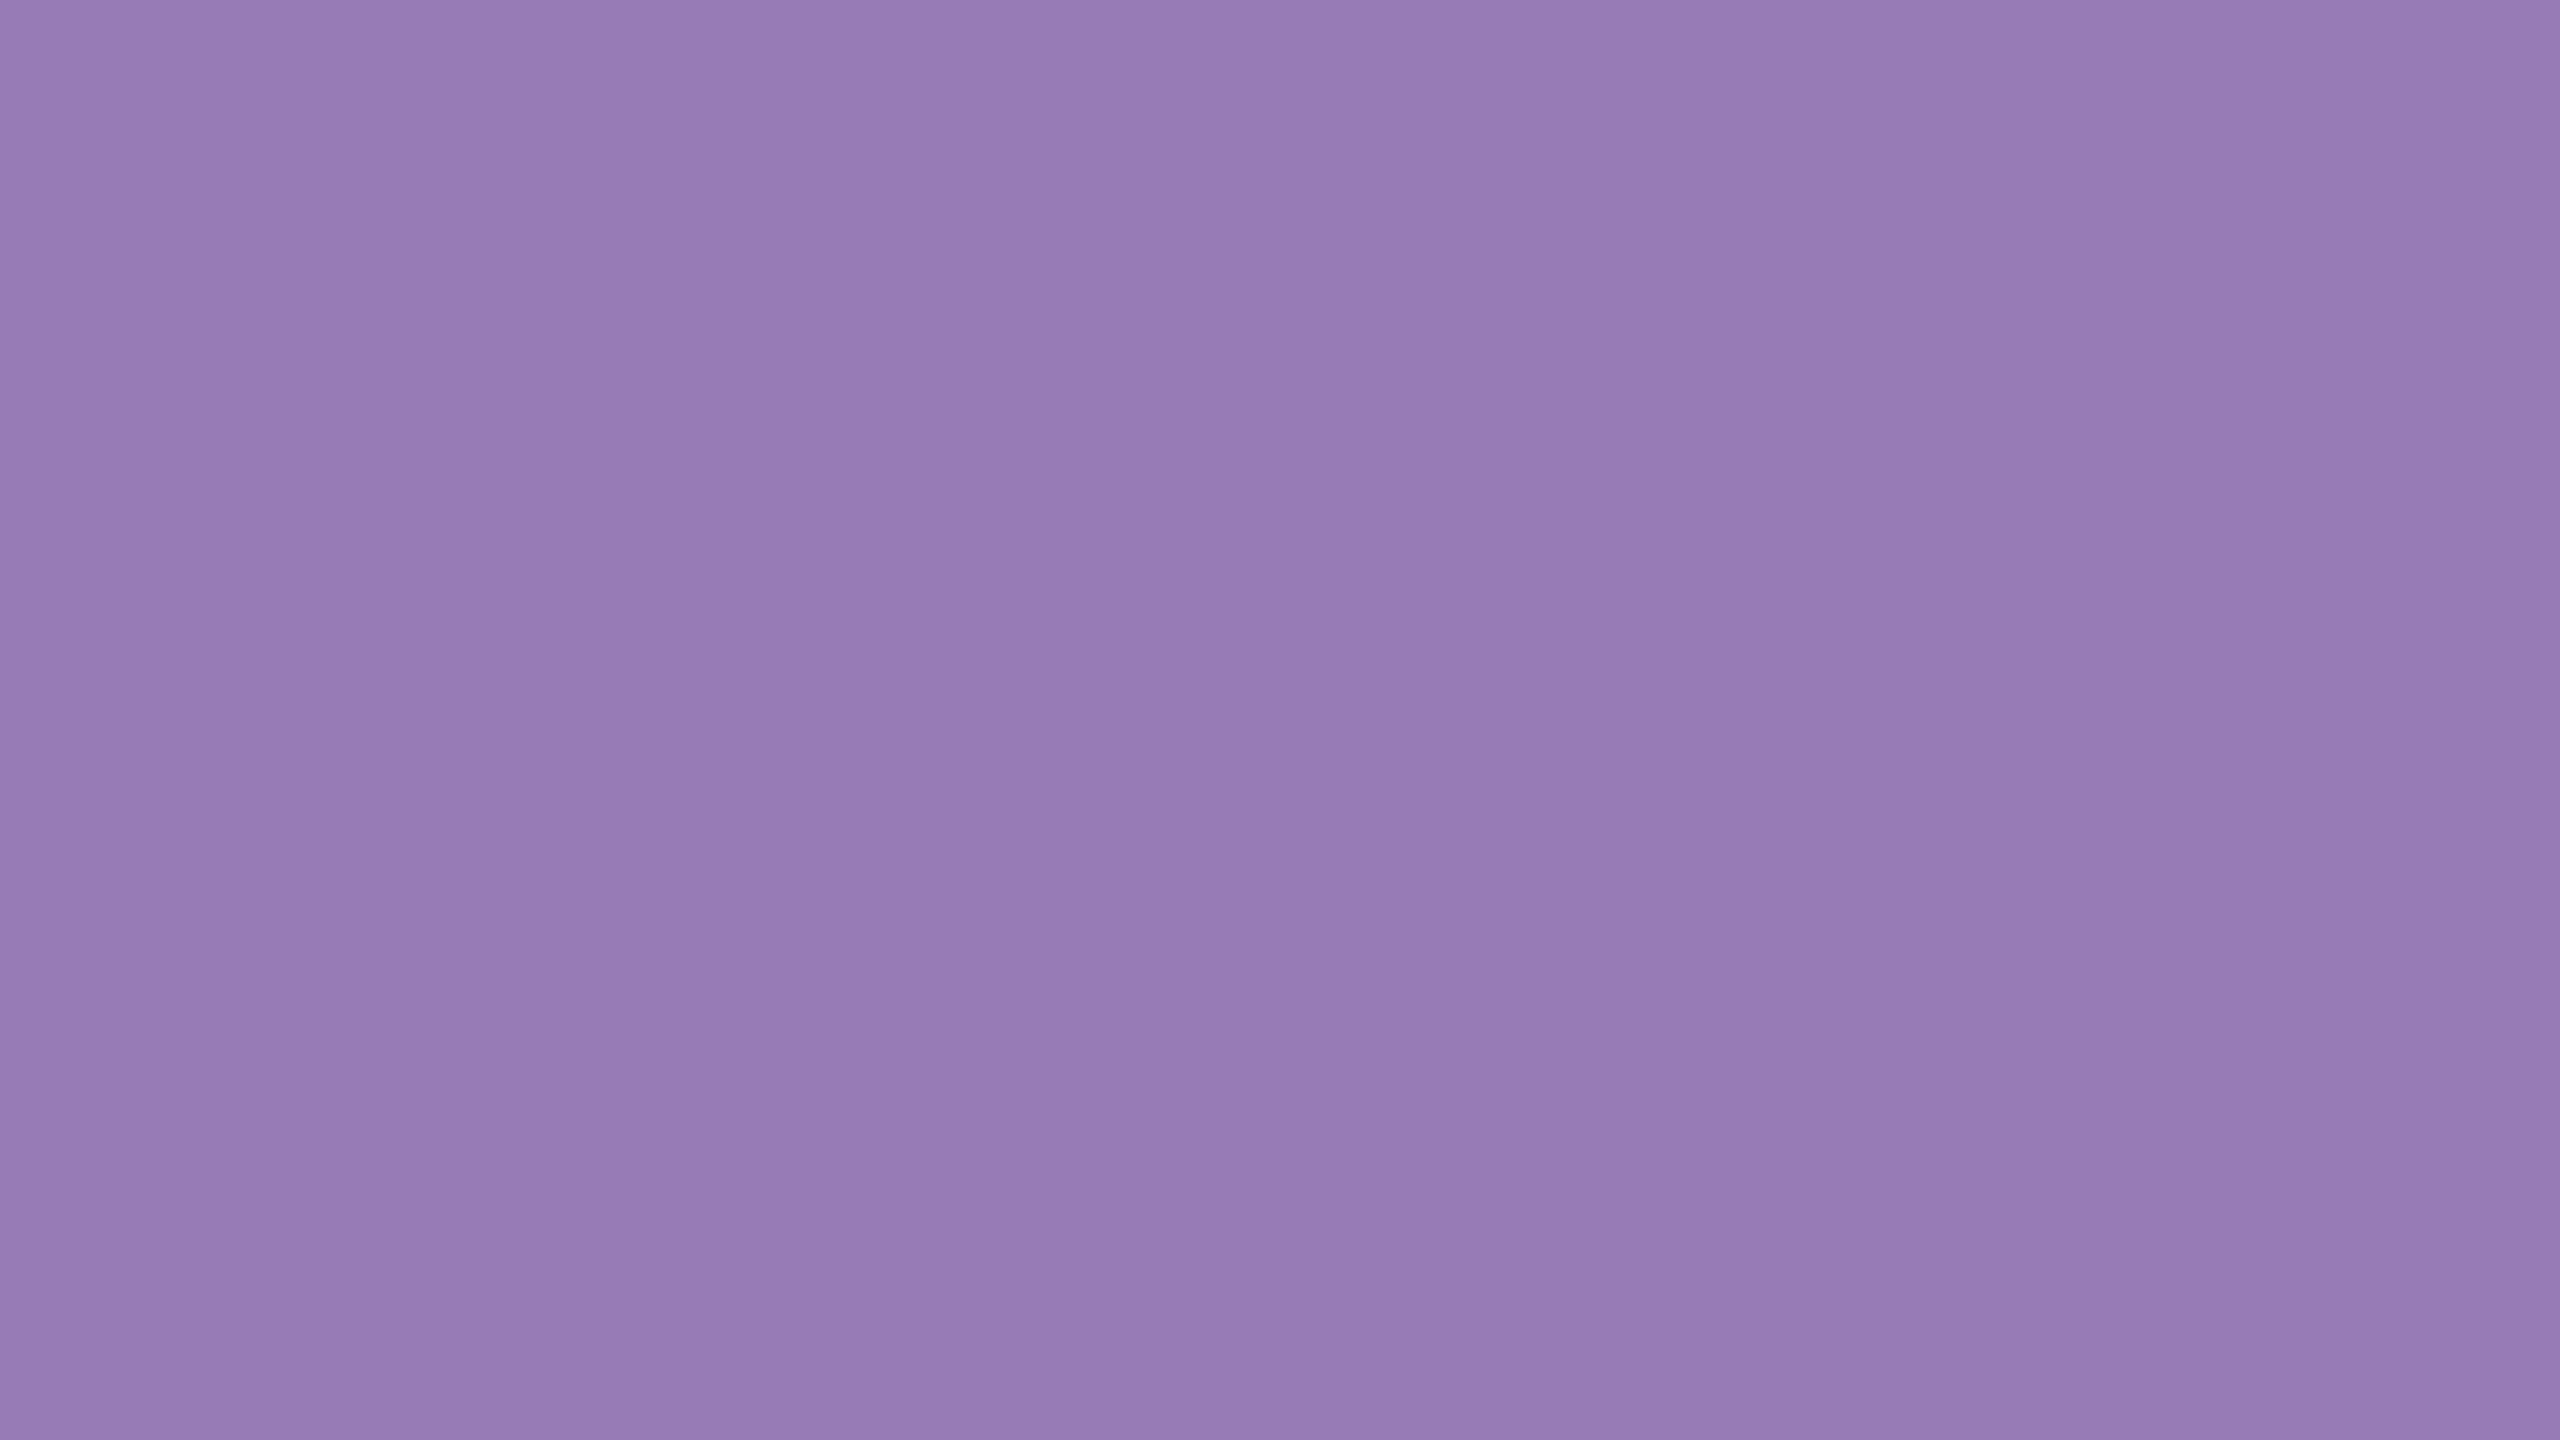 2560x1440 Lavender Purple Solid Color Background